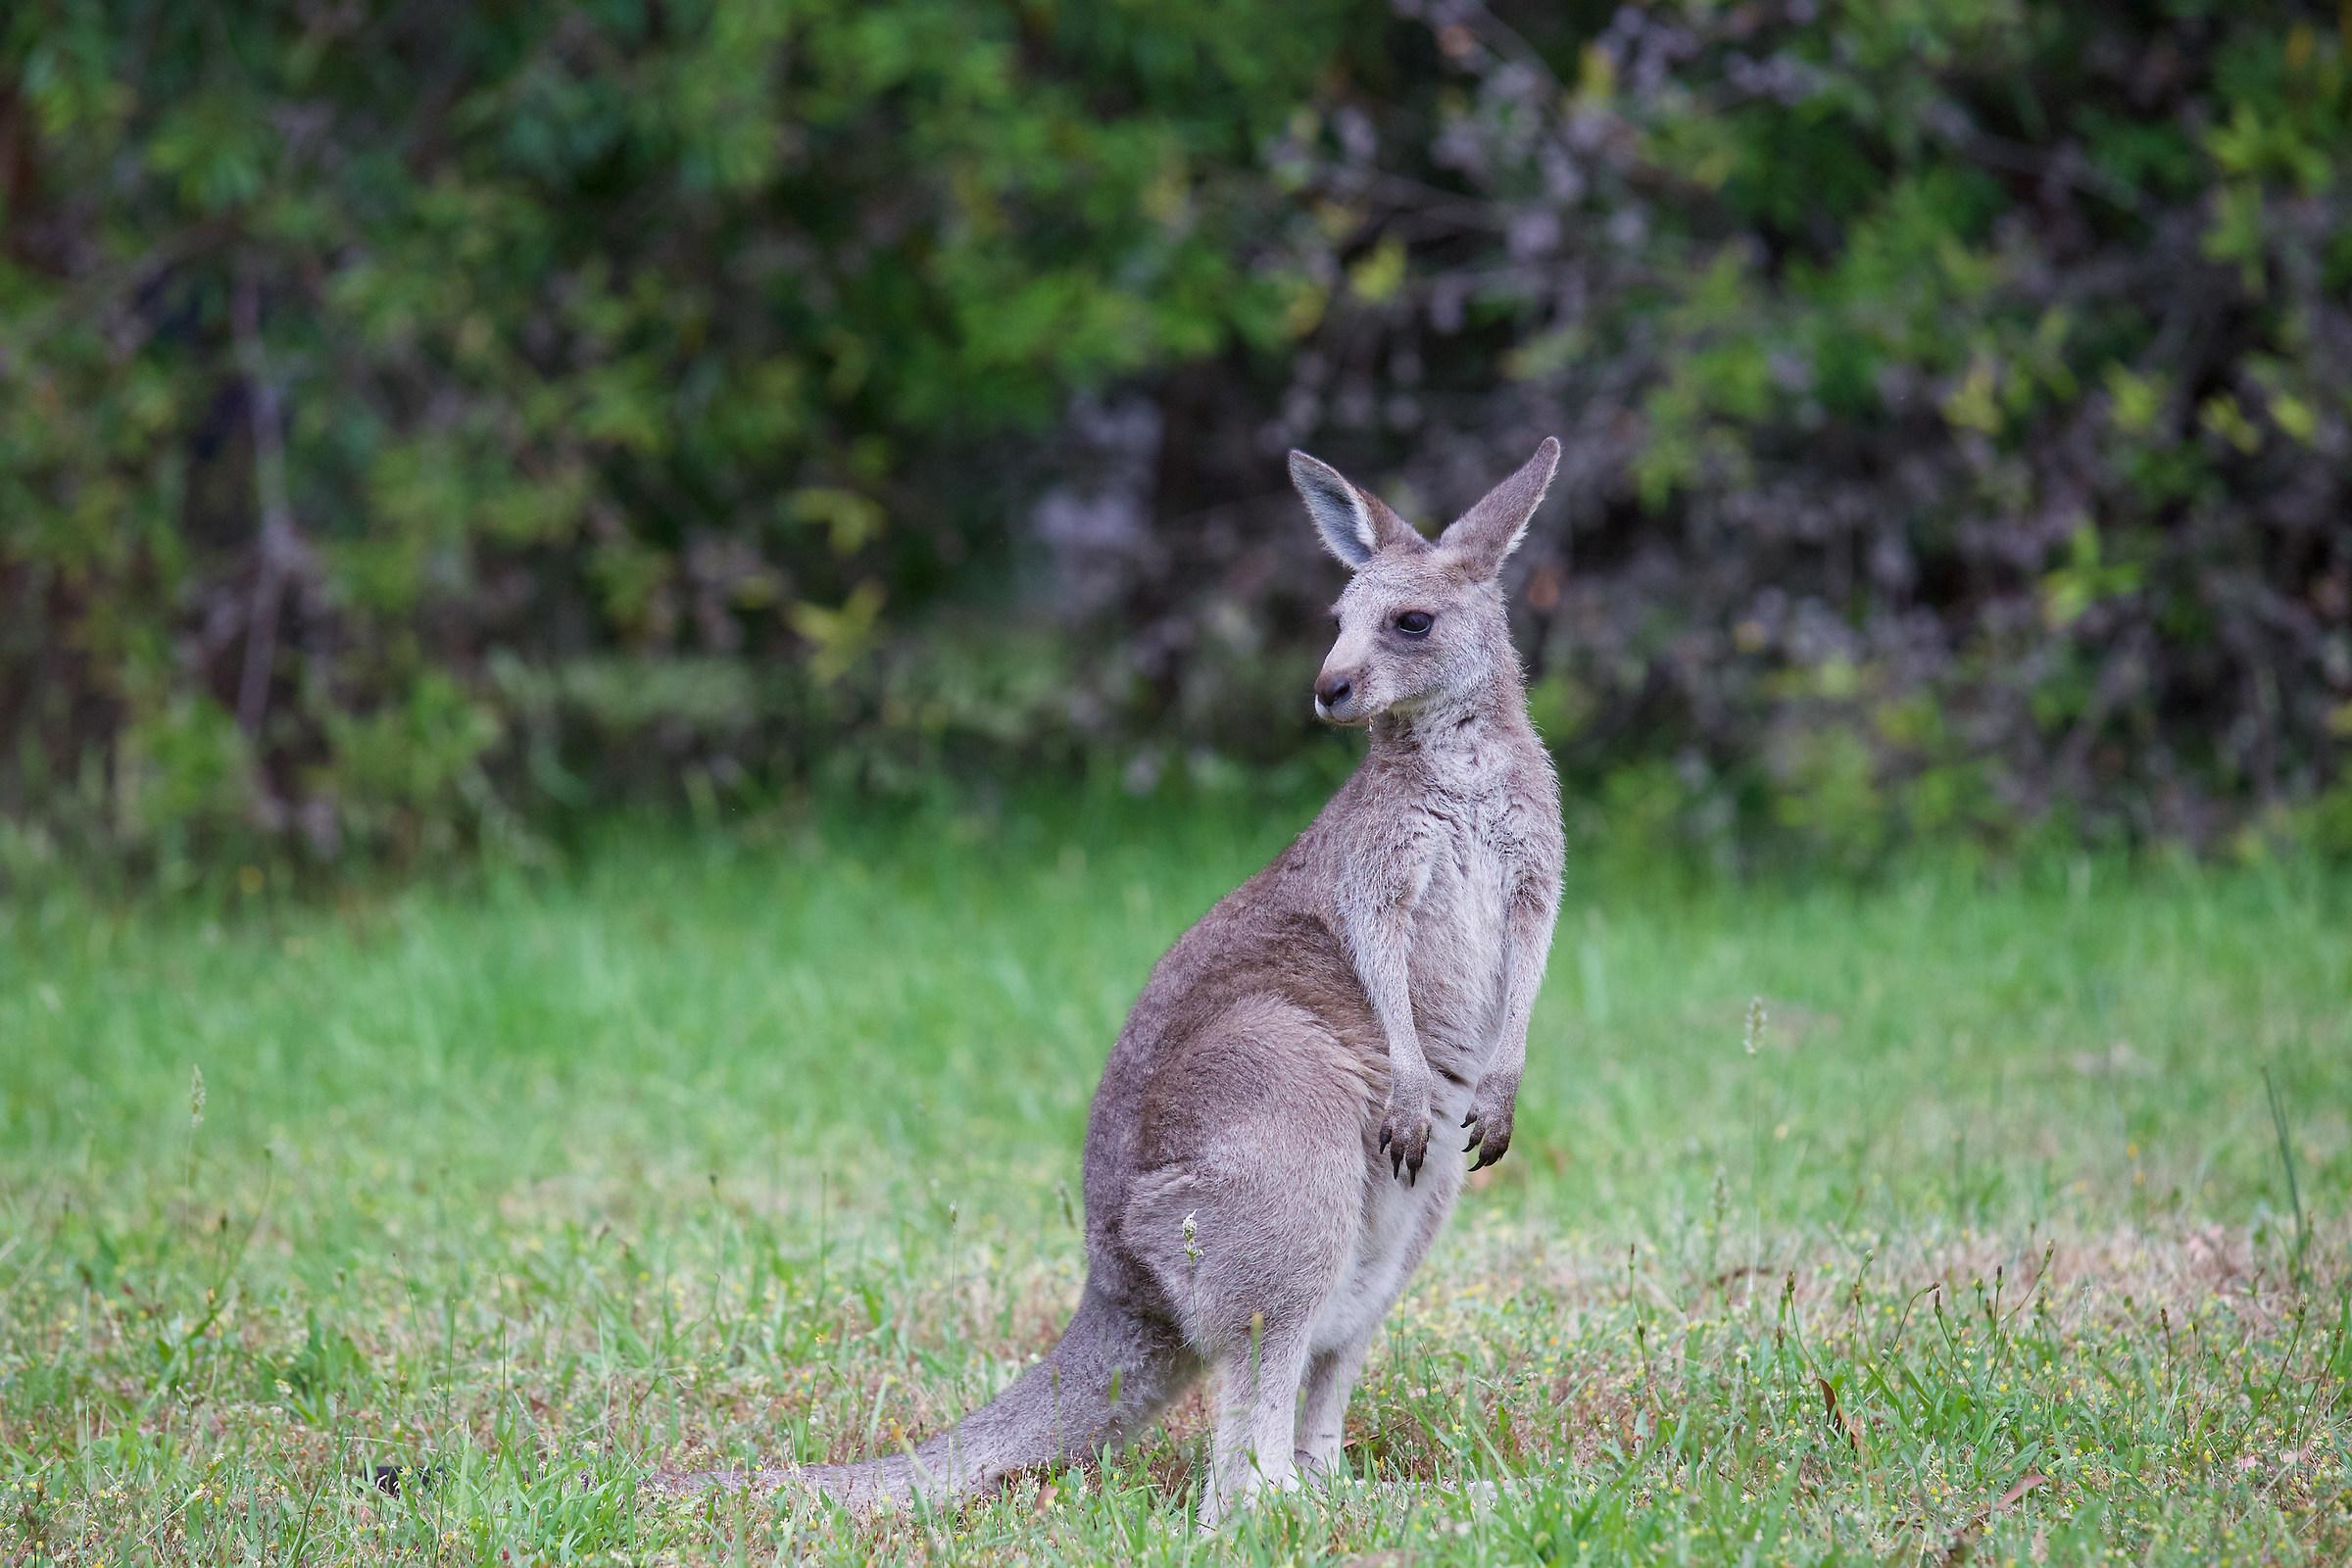 Kangaroo...